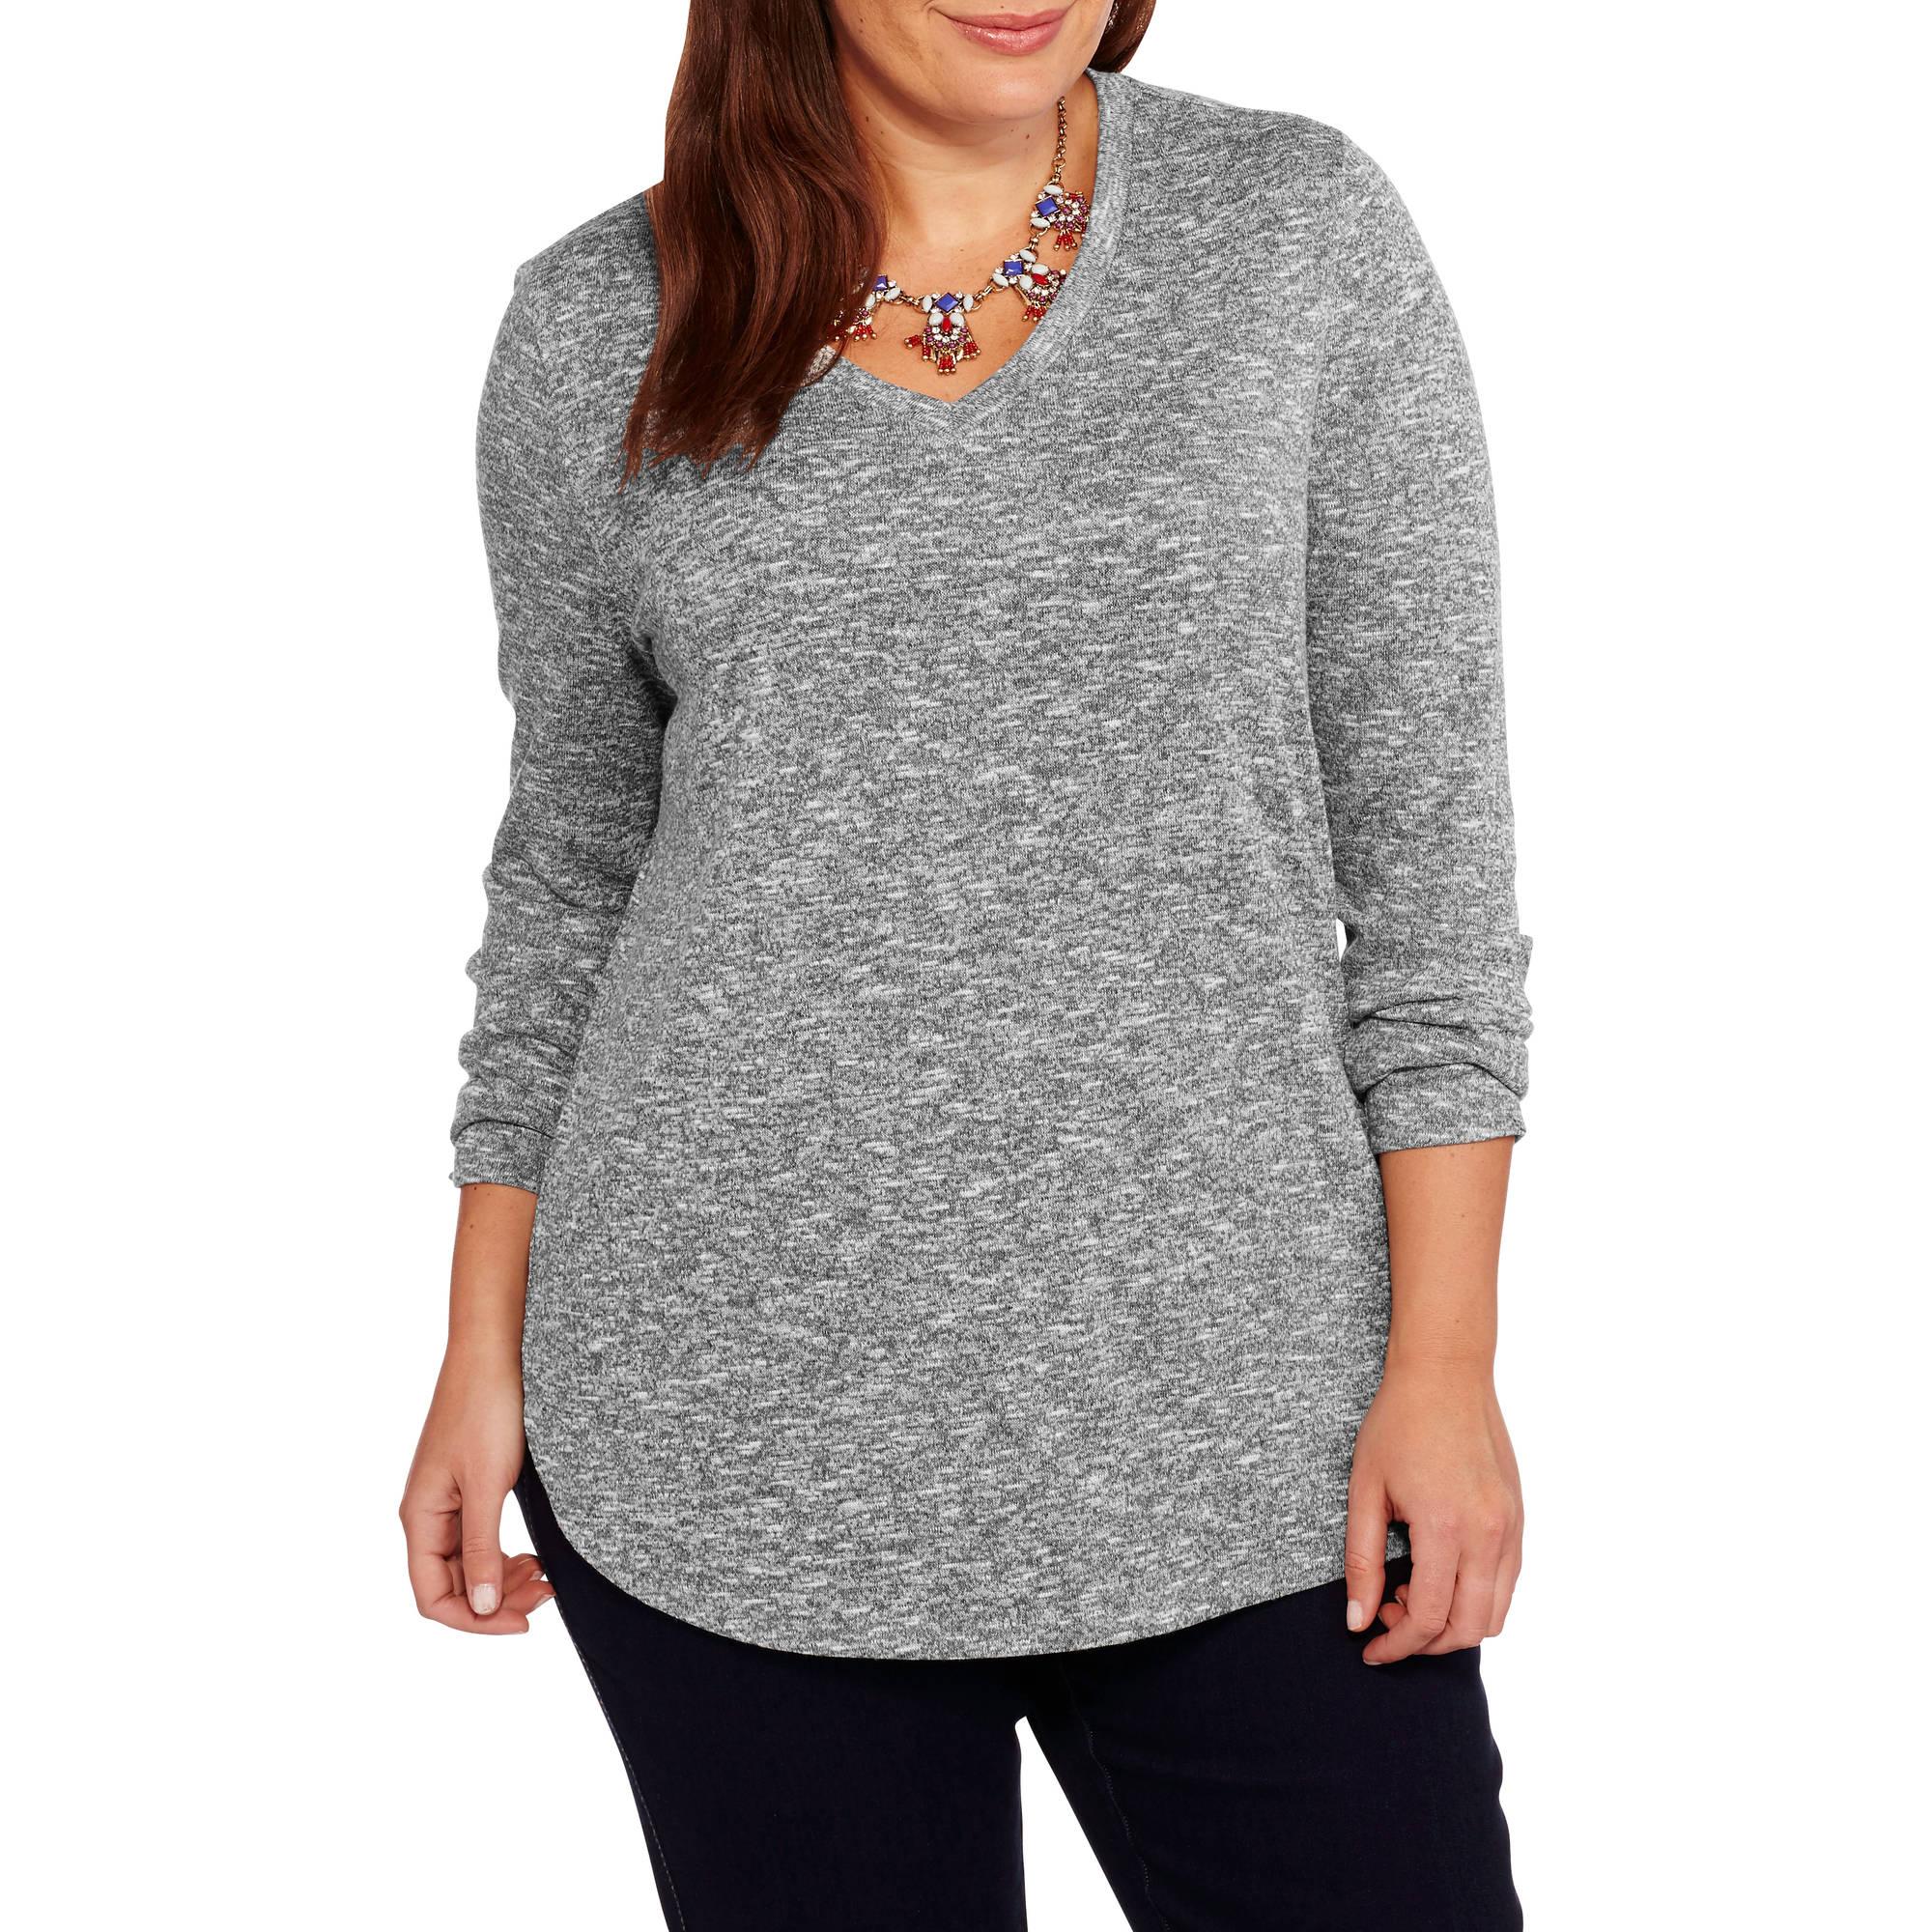 Faded Glory Women's Plus-Size Lightweight V Neck Long Sleeve Knit Top